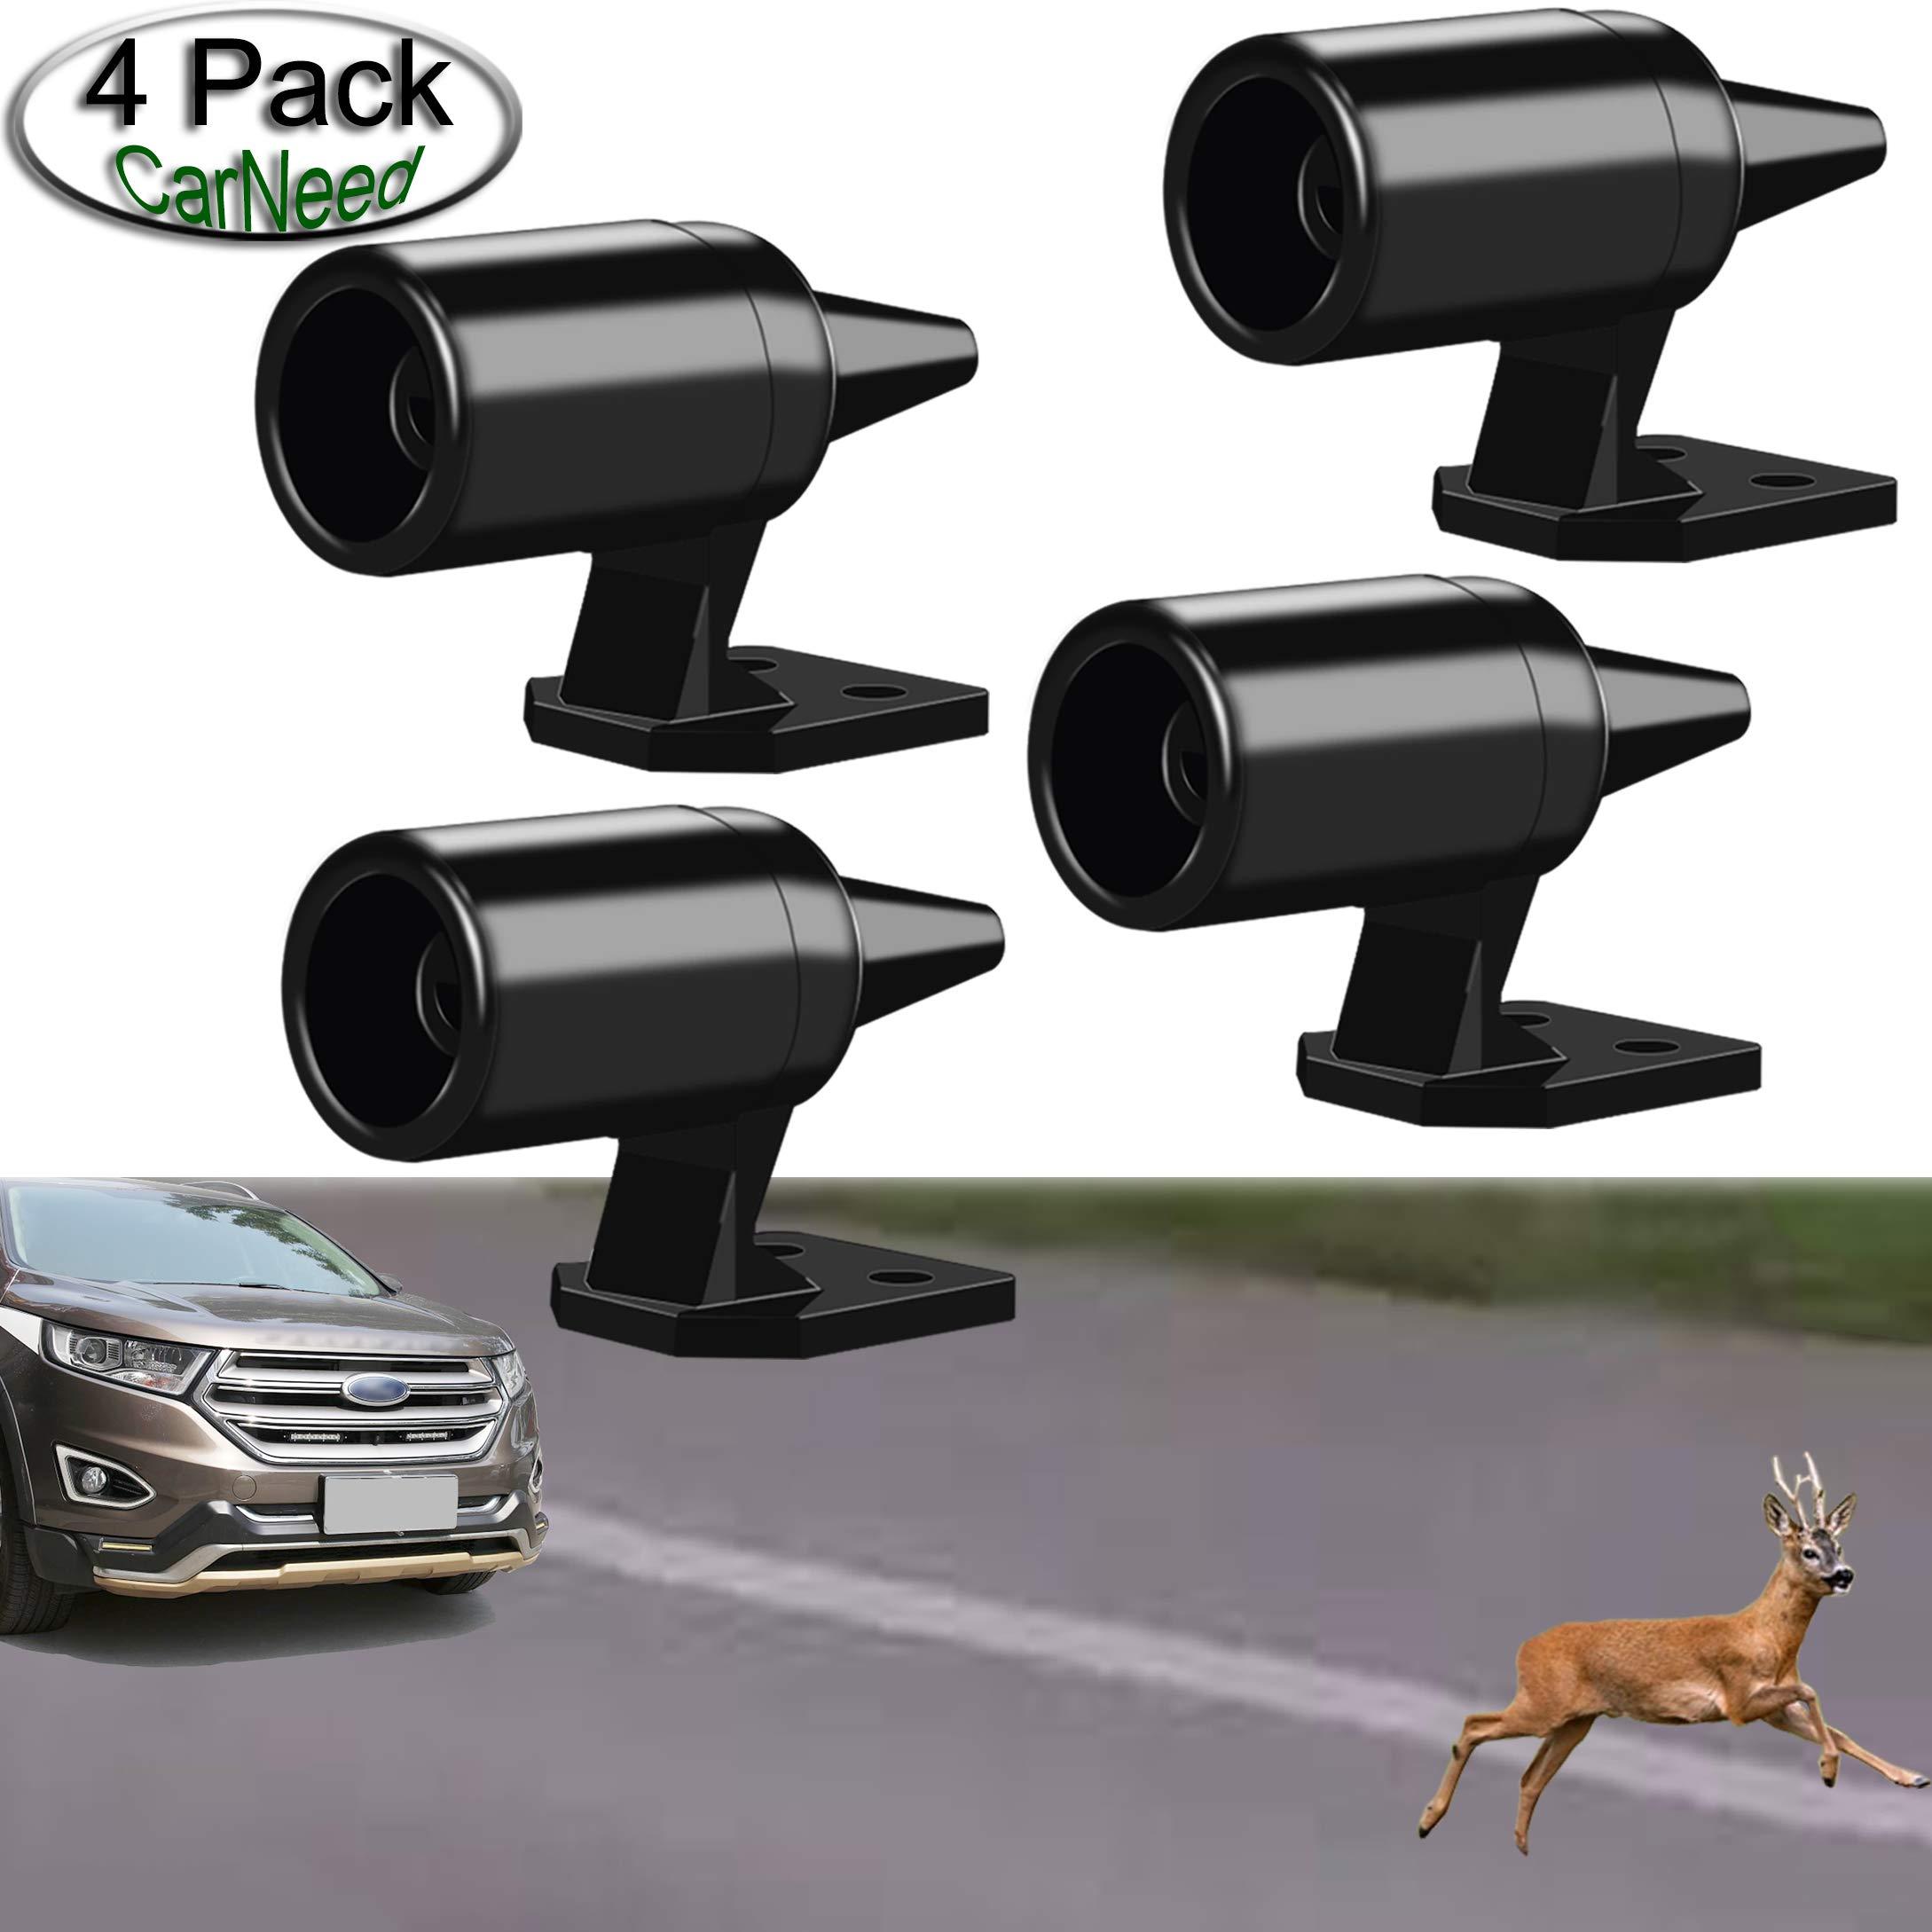 Deer Warning Whistles auto safety alert device black 2 x Ultrasonic Car Animal